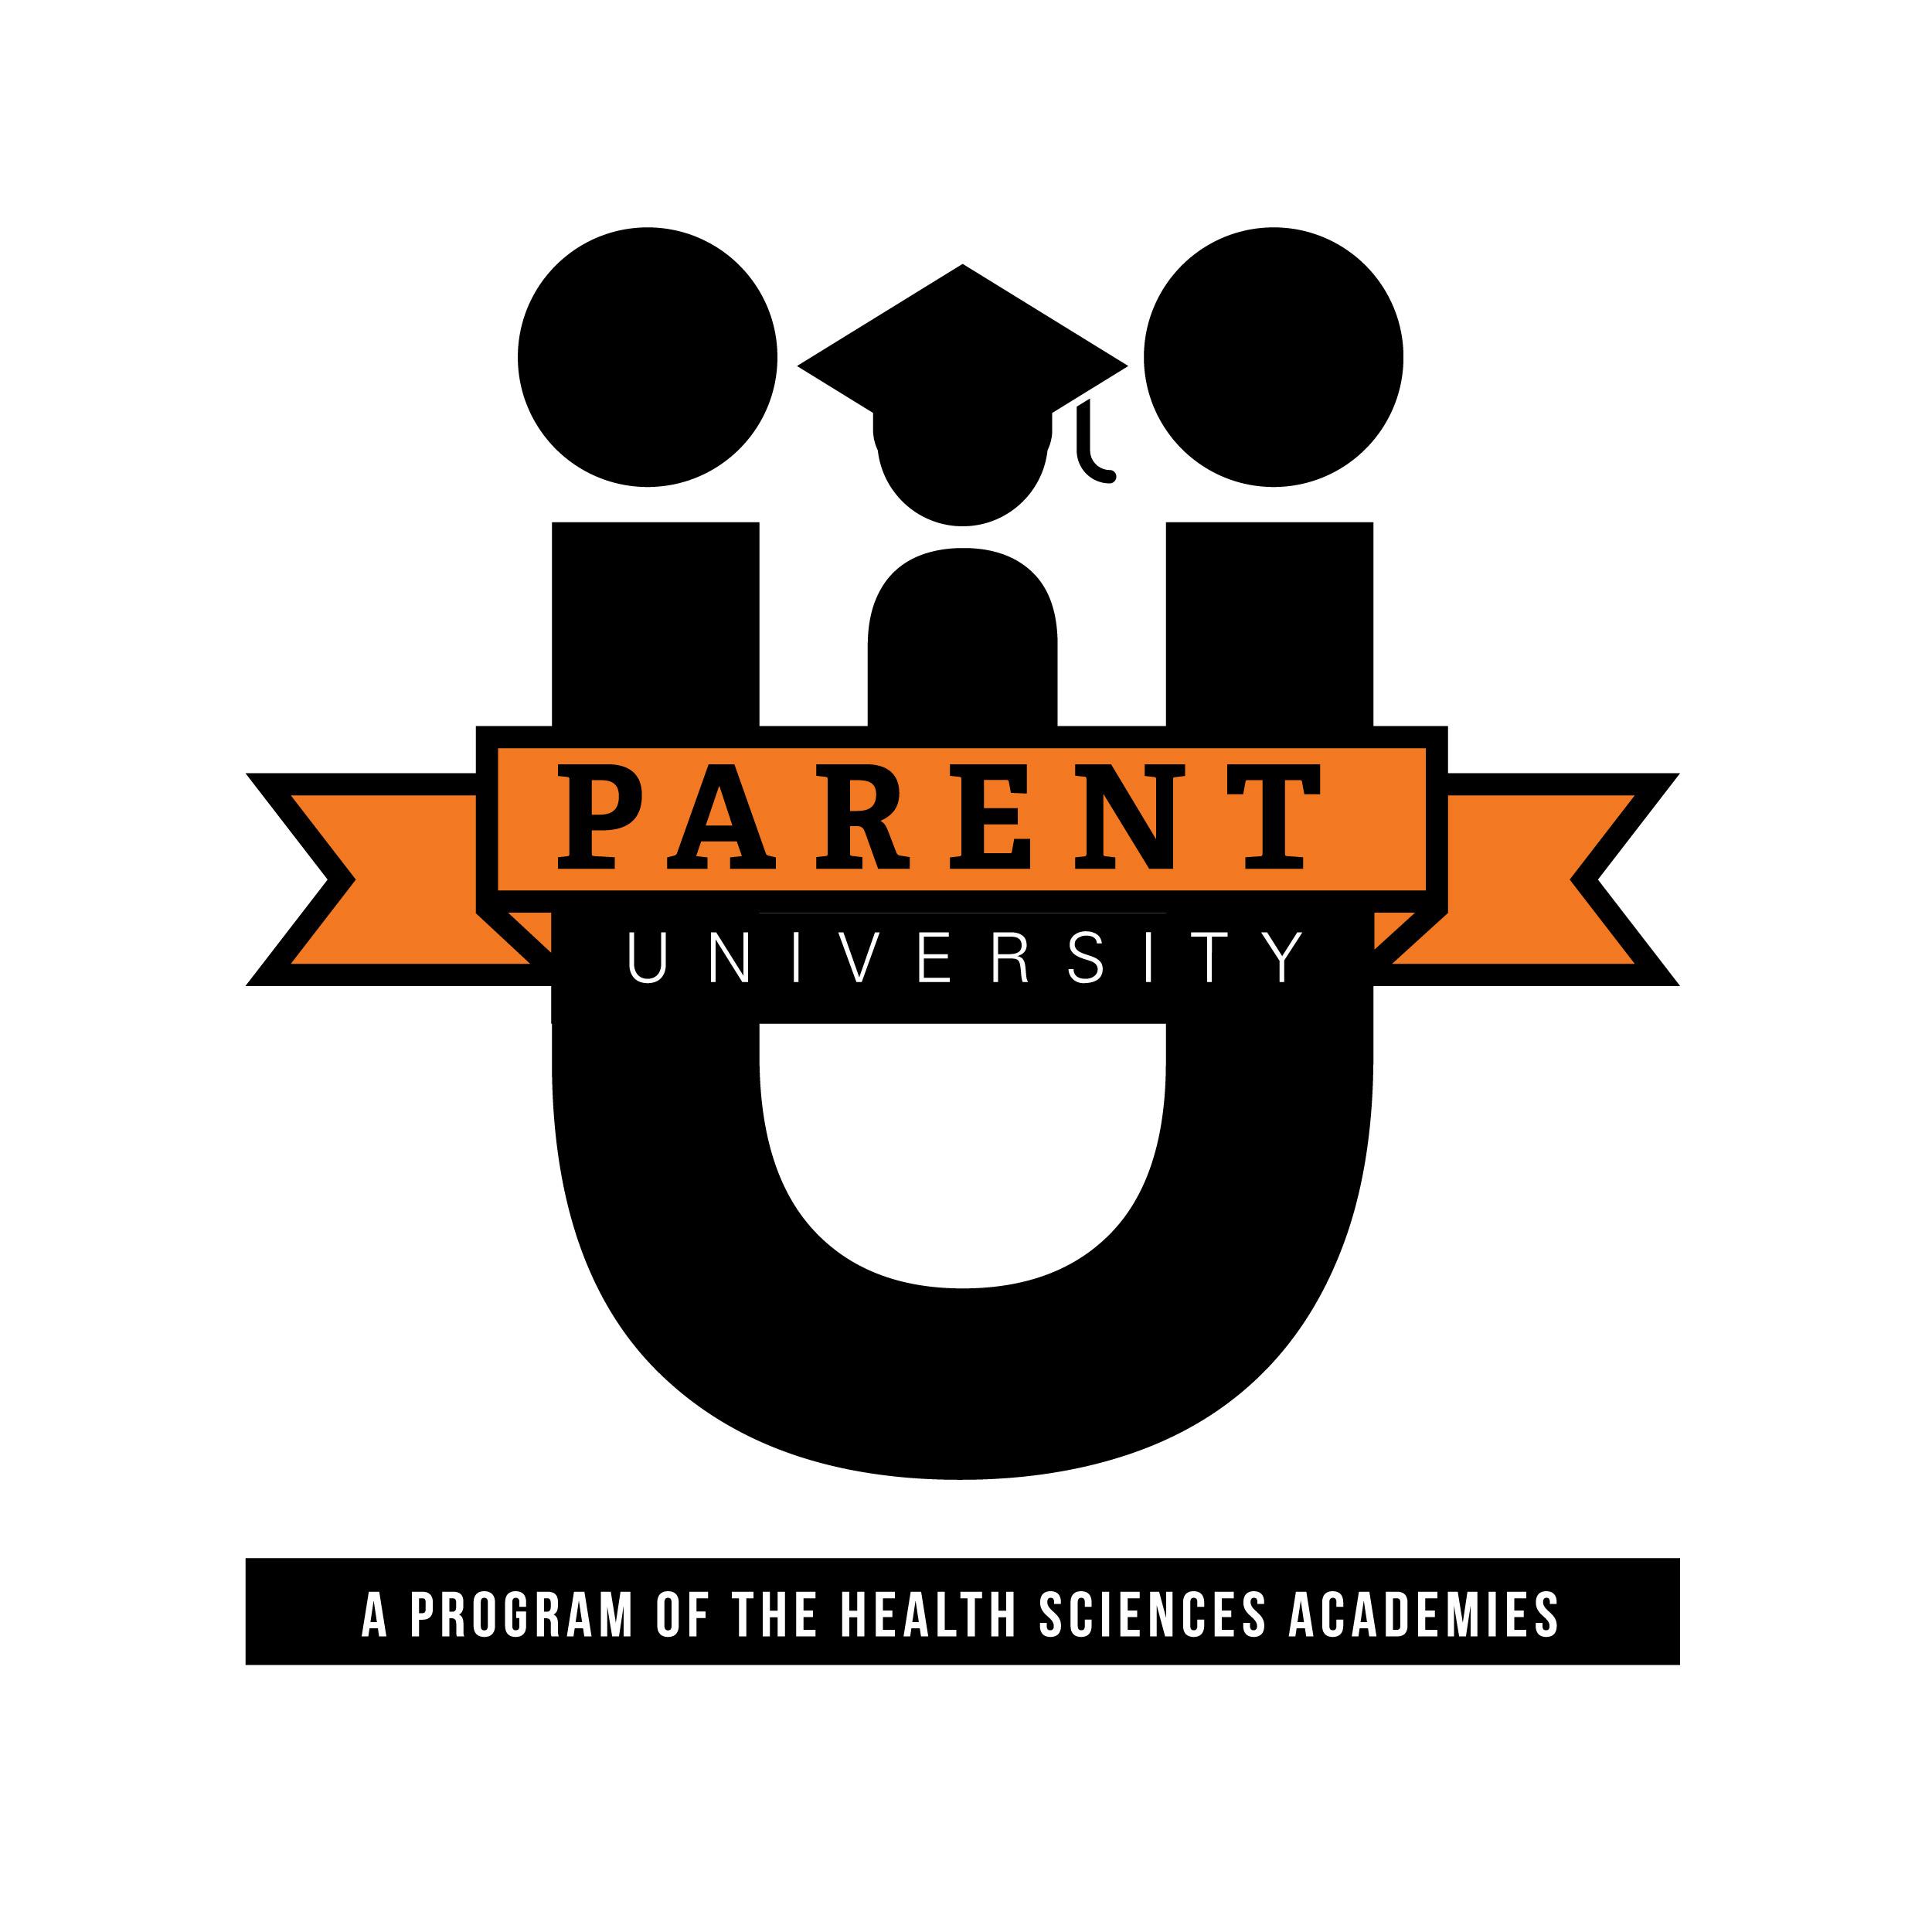 Parent University_Orange_Black.jpg